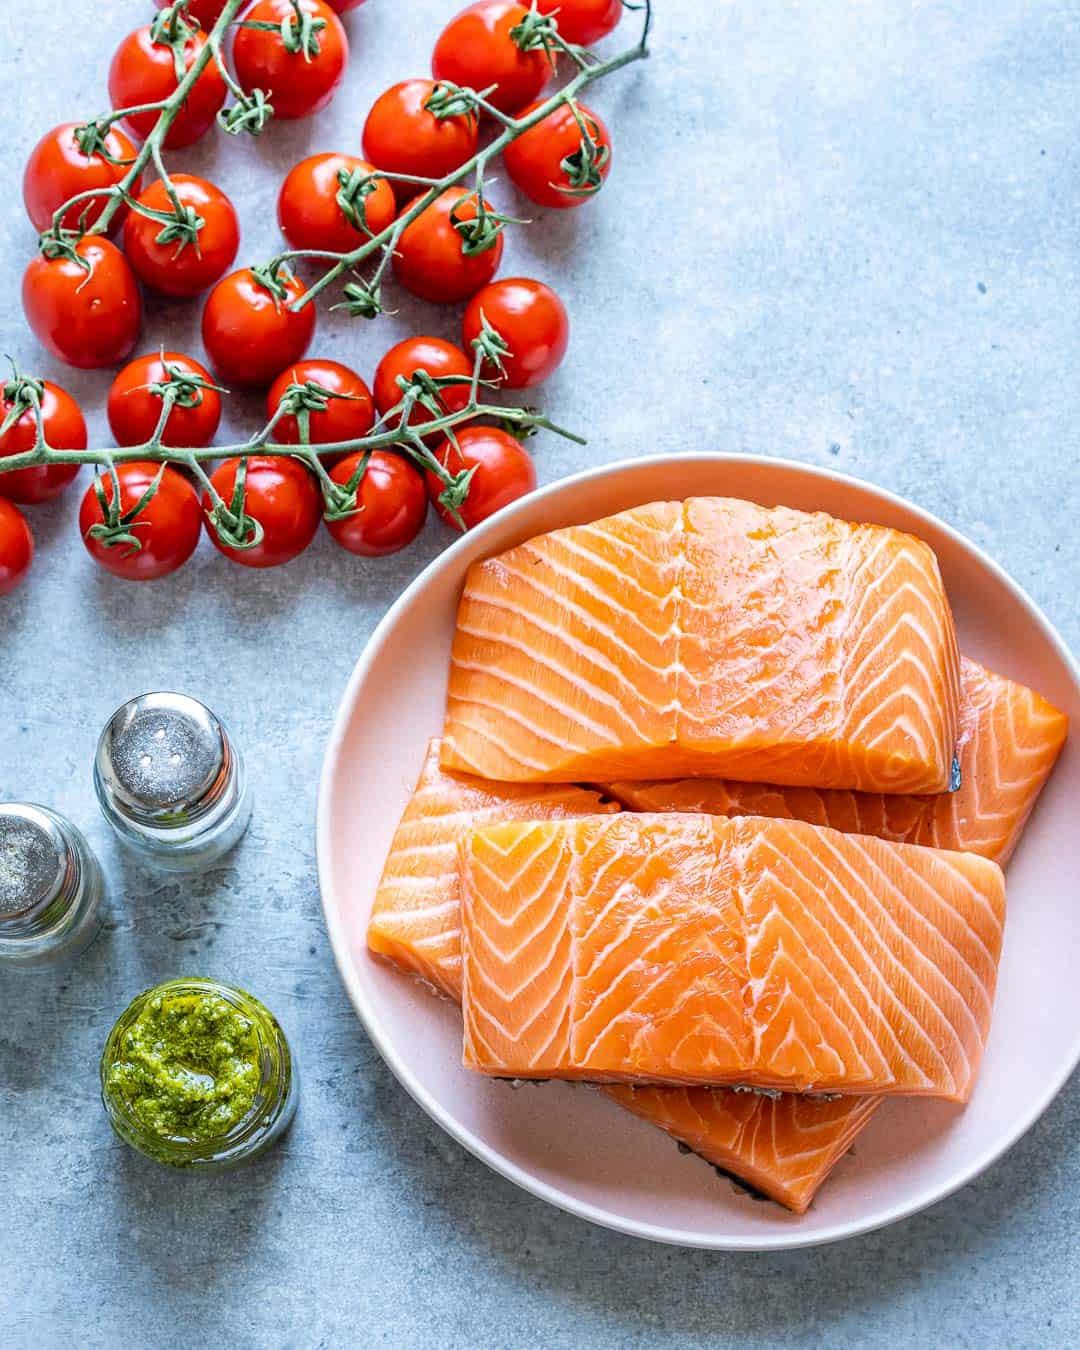 Ingredients for pesto salmon on counter